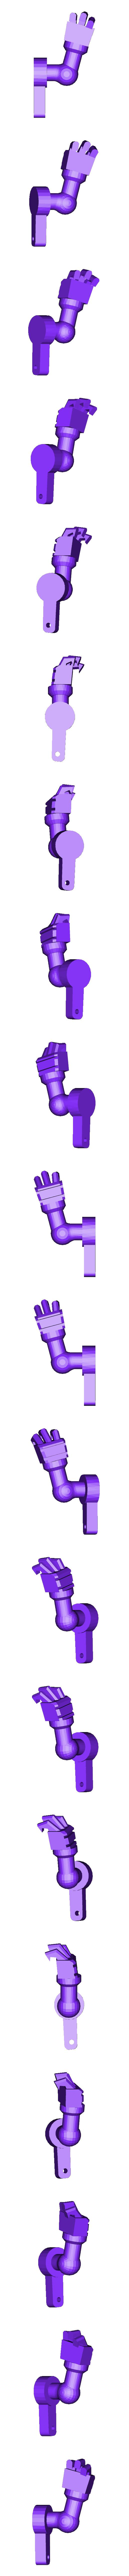 18- G1 ALLICON- Right Claw.stl Download STL file Transformers G1 Allicon (11cm Scale) • 3D print object, mmshightail